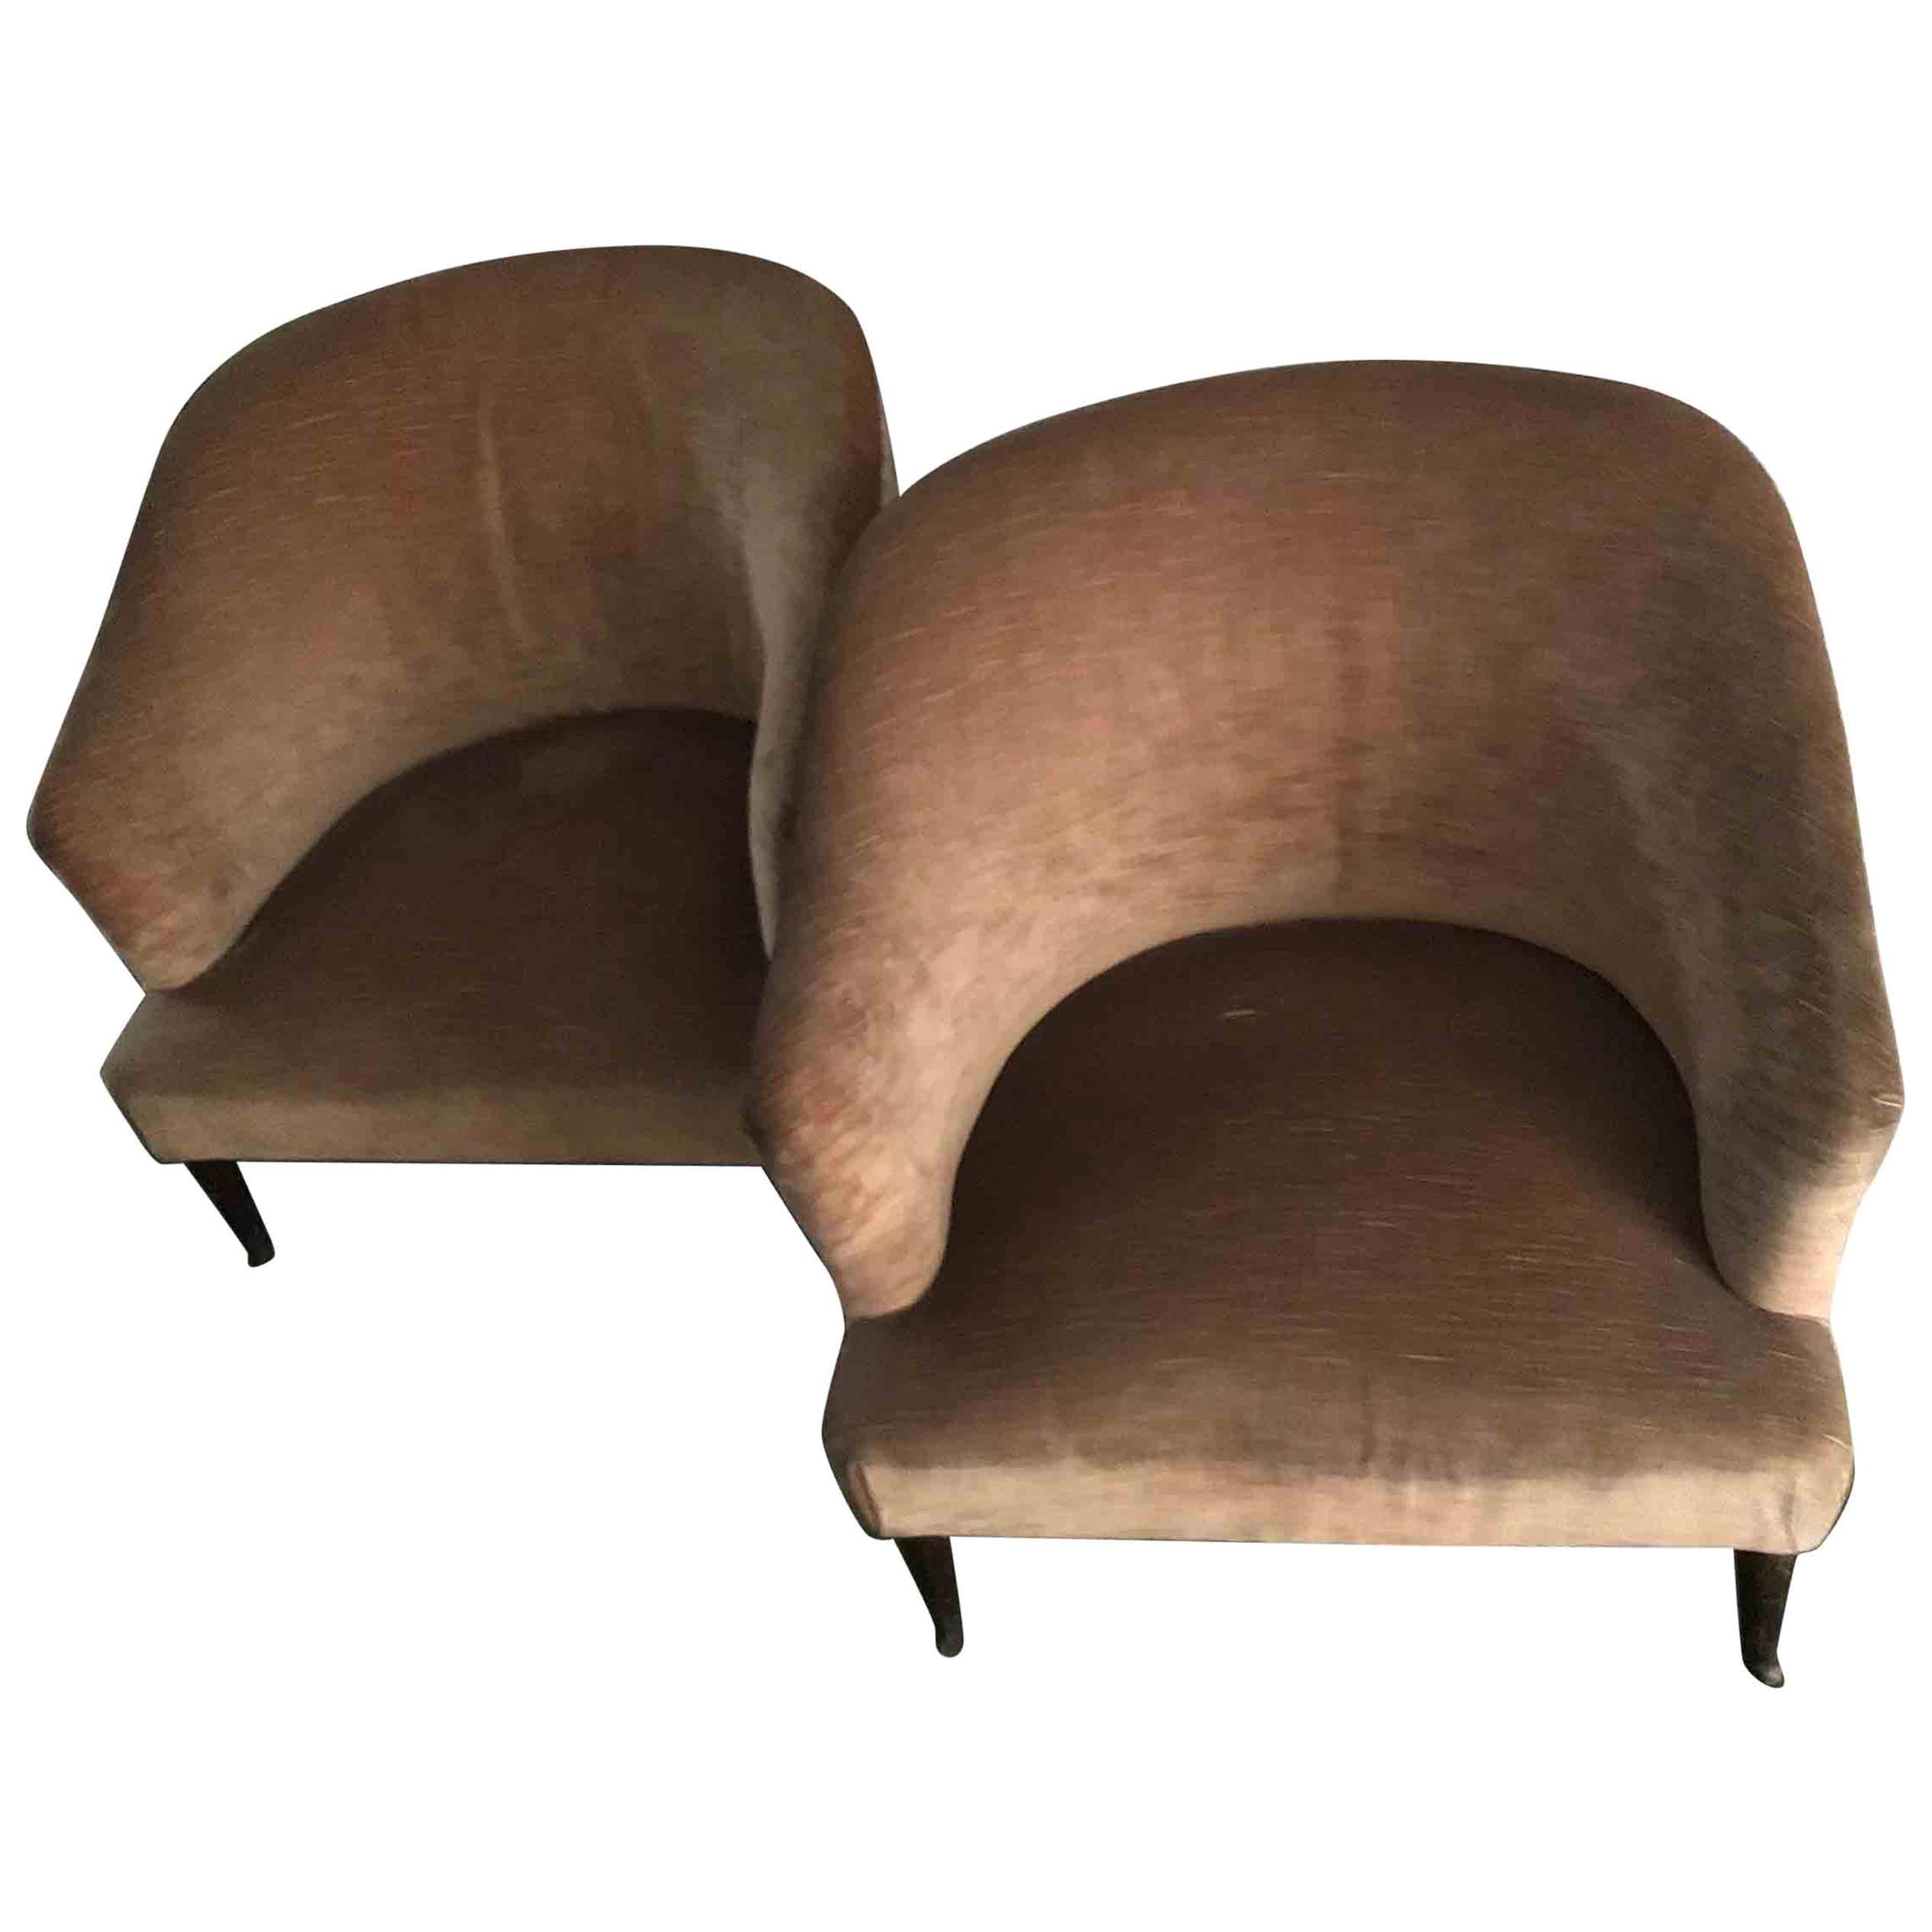 Gio'  Ponti Velvet Upholstered Armchairs Rosewood Wood Feet, 1950, Italy